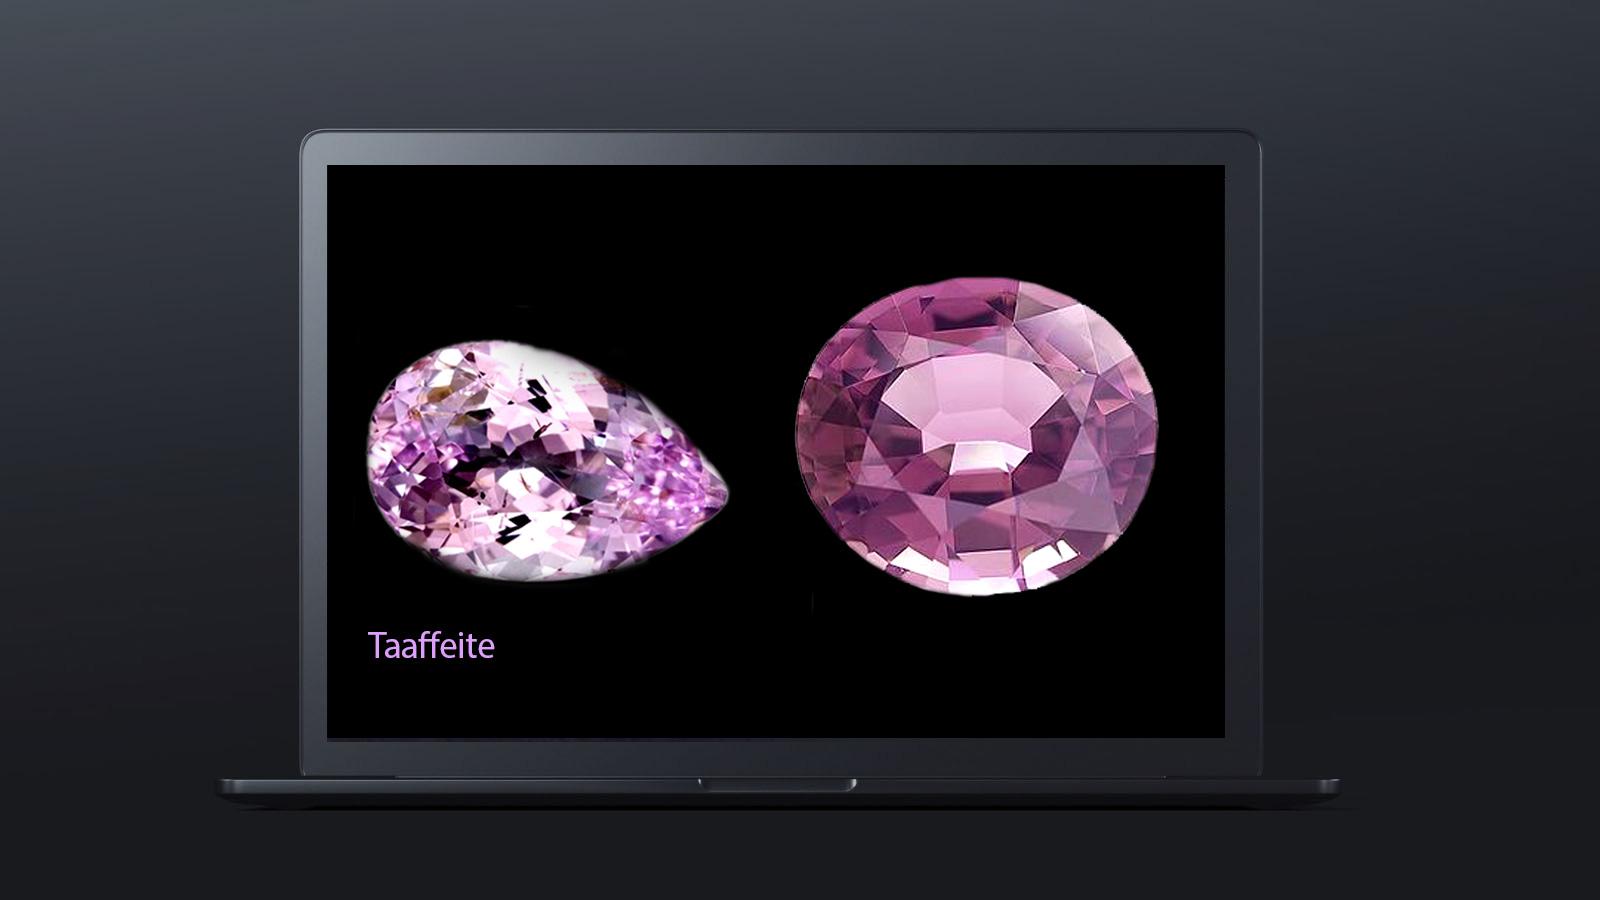 10 worlds rarest gemstones Taaffeite 1 - ده گوهر کمیاب دنیا کدامند؟